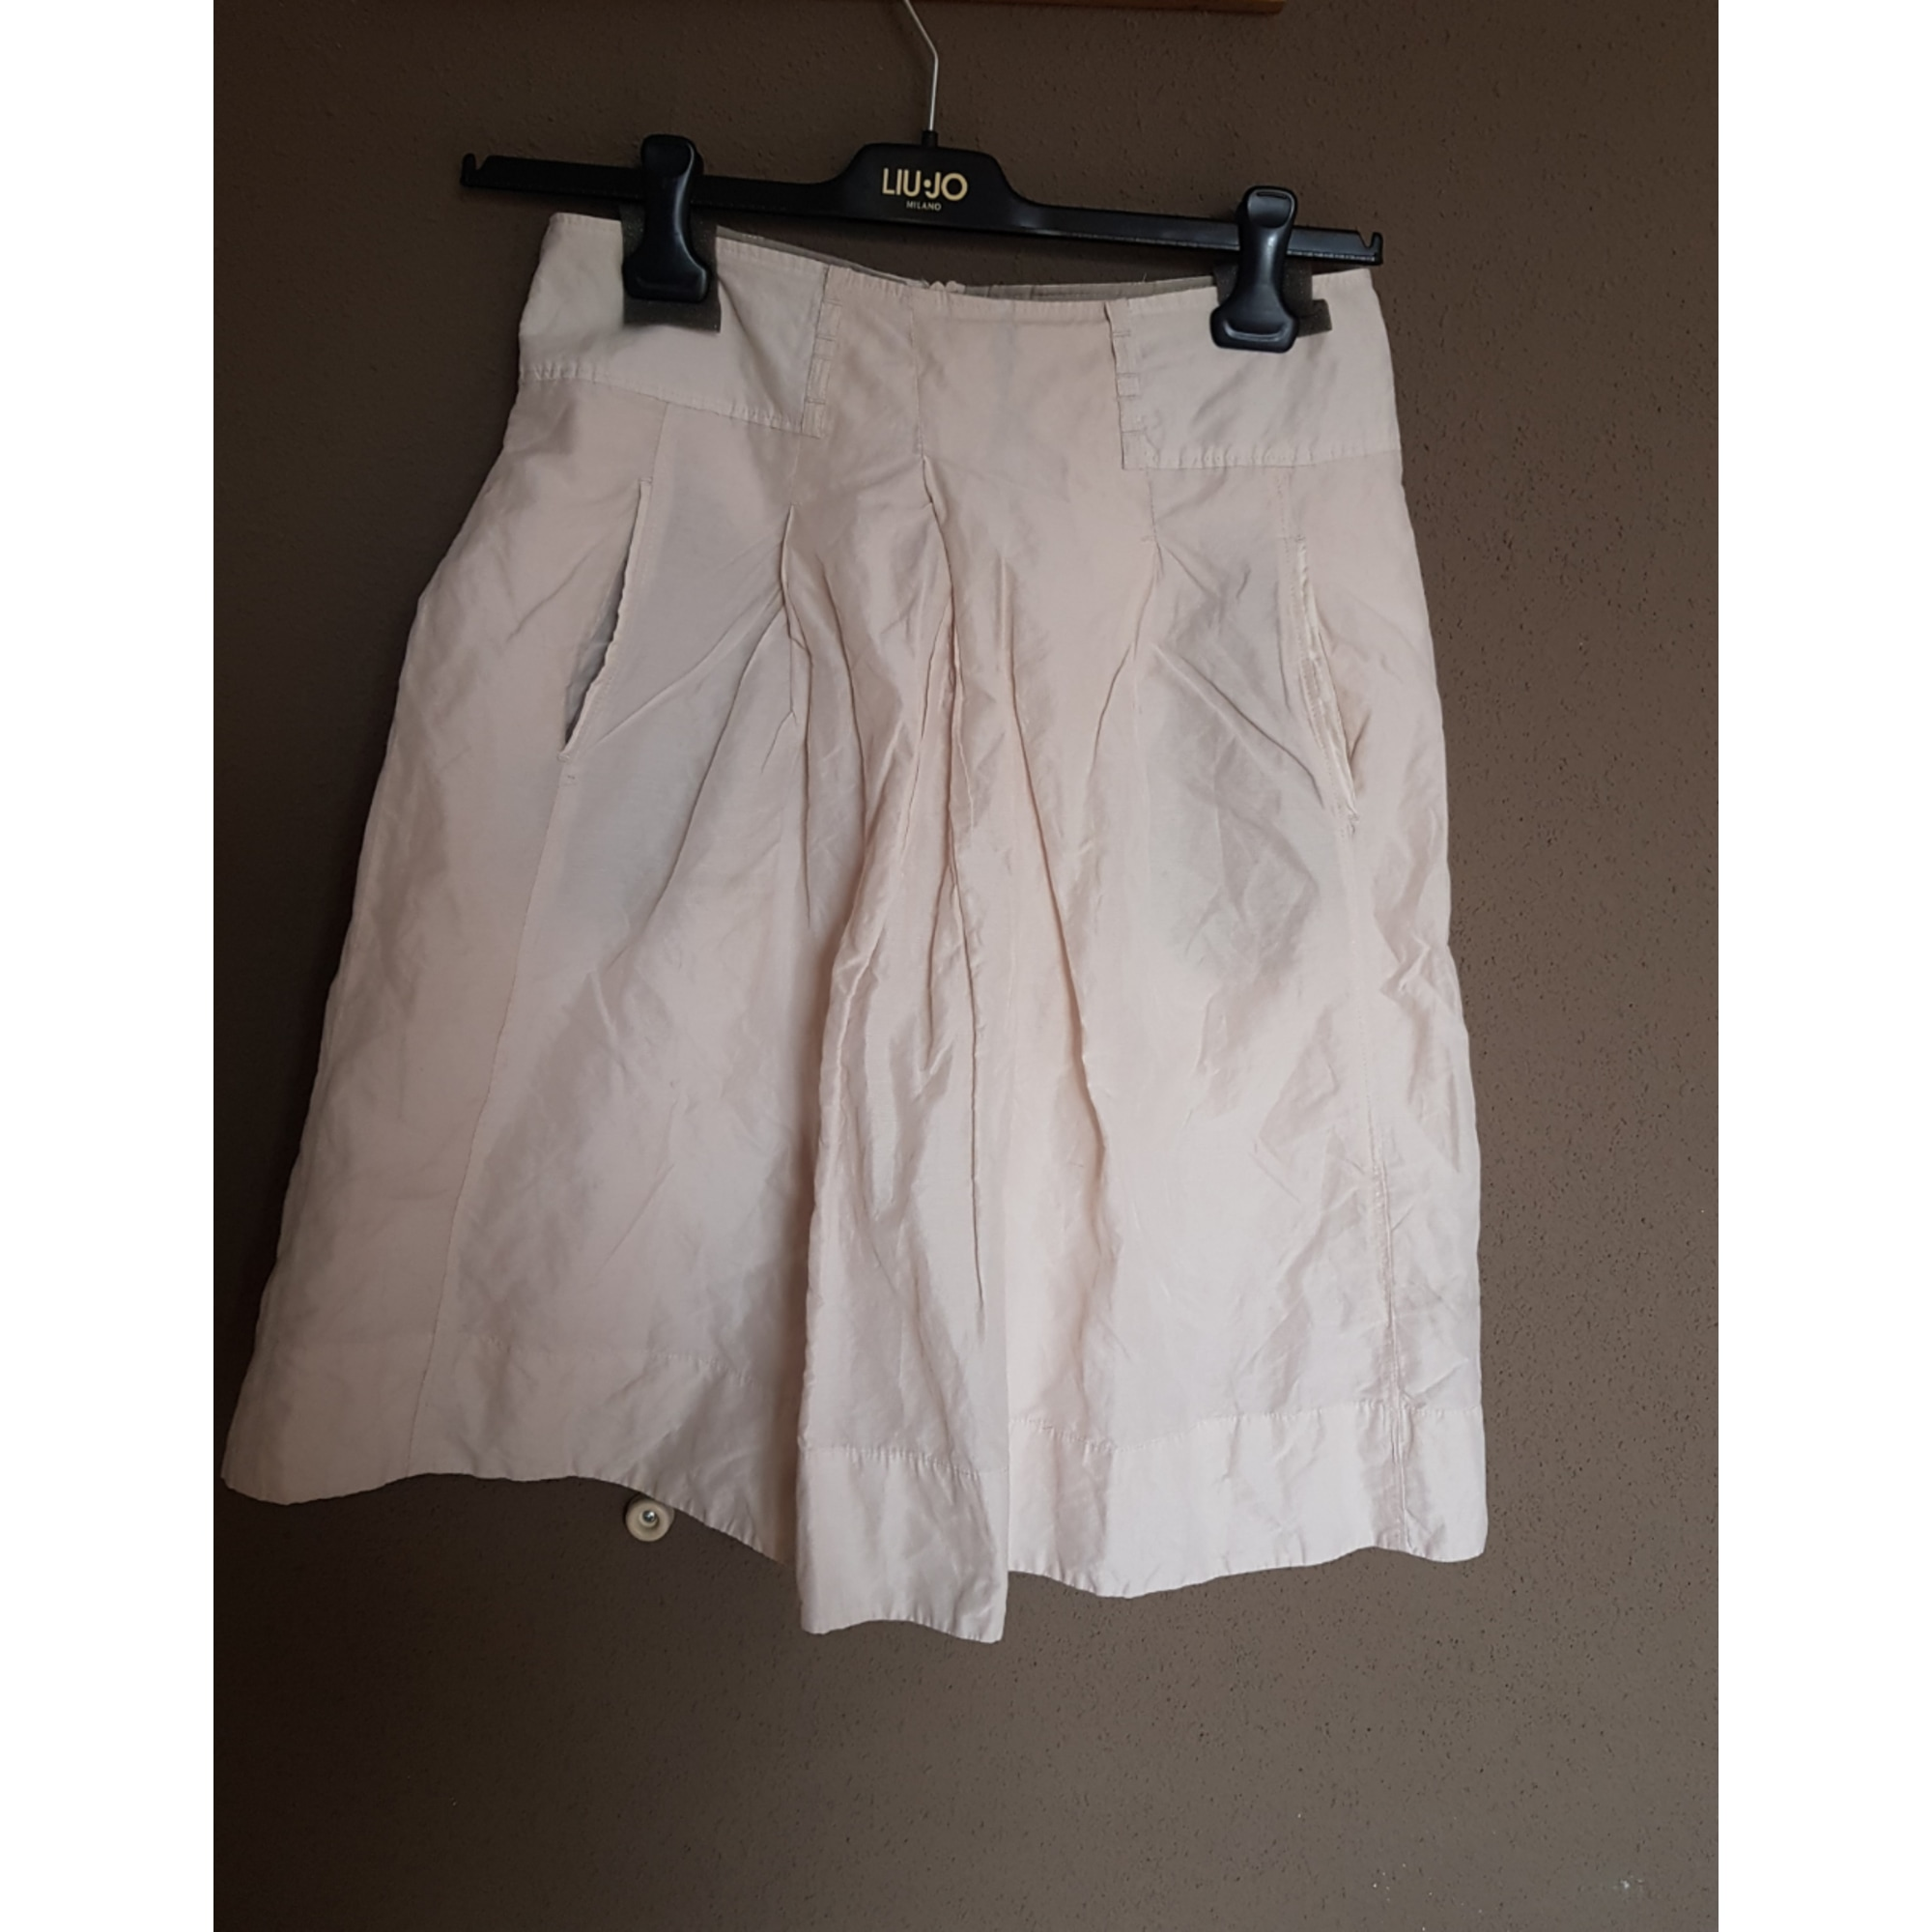 Jupe mi-longue CHATTAWAK Blanc, blanc cassé, écru